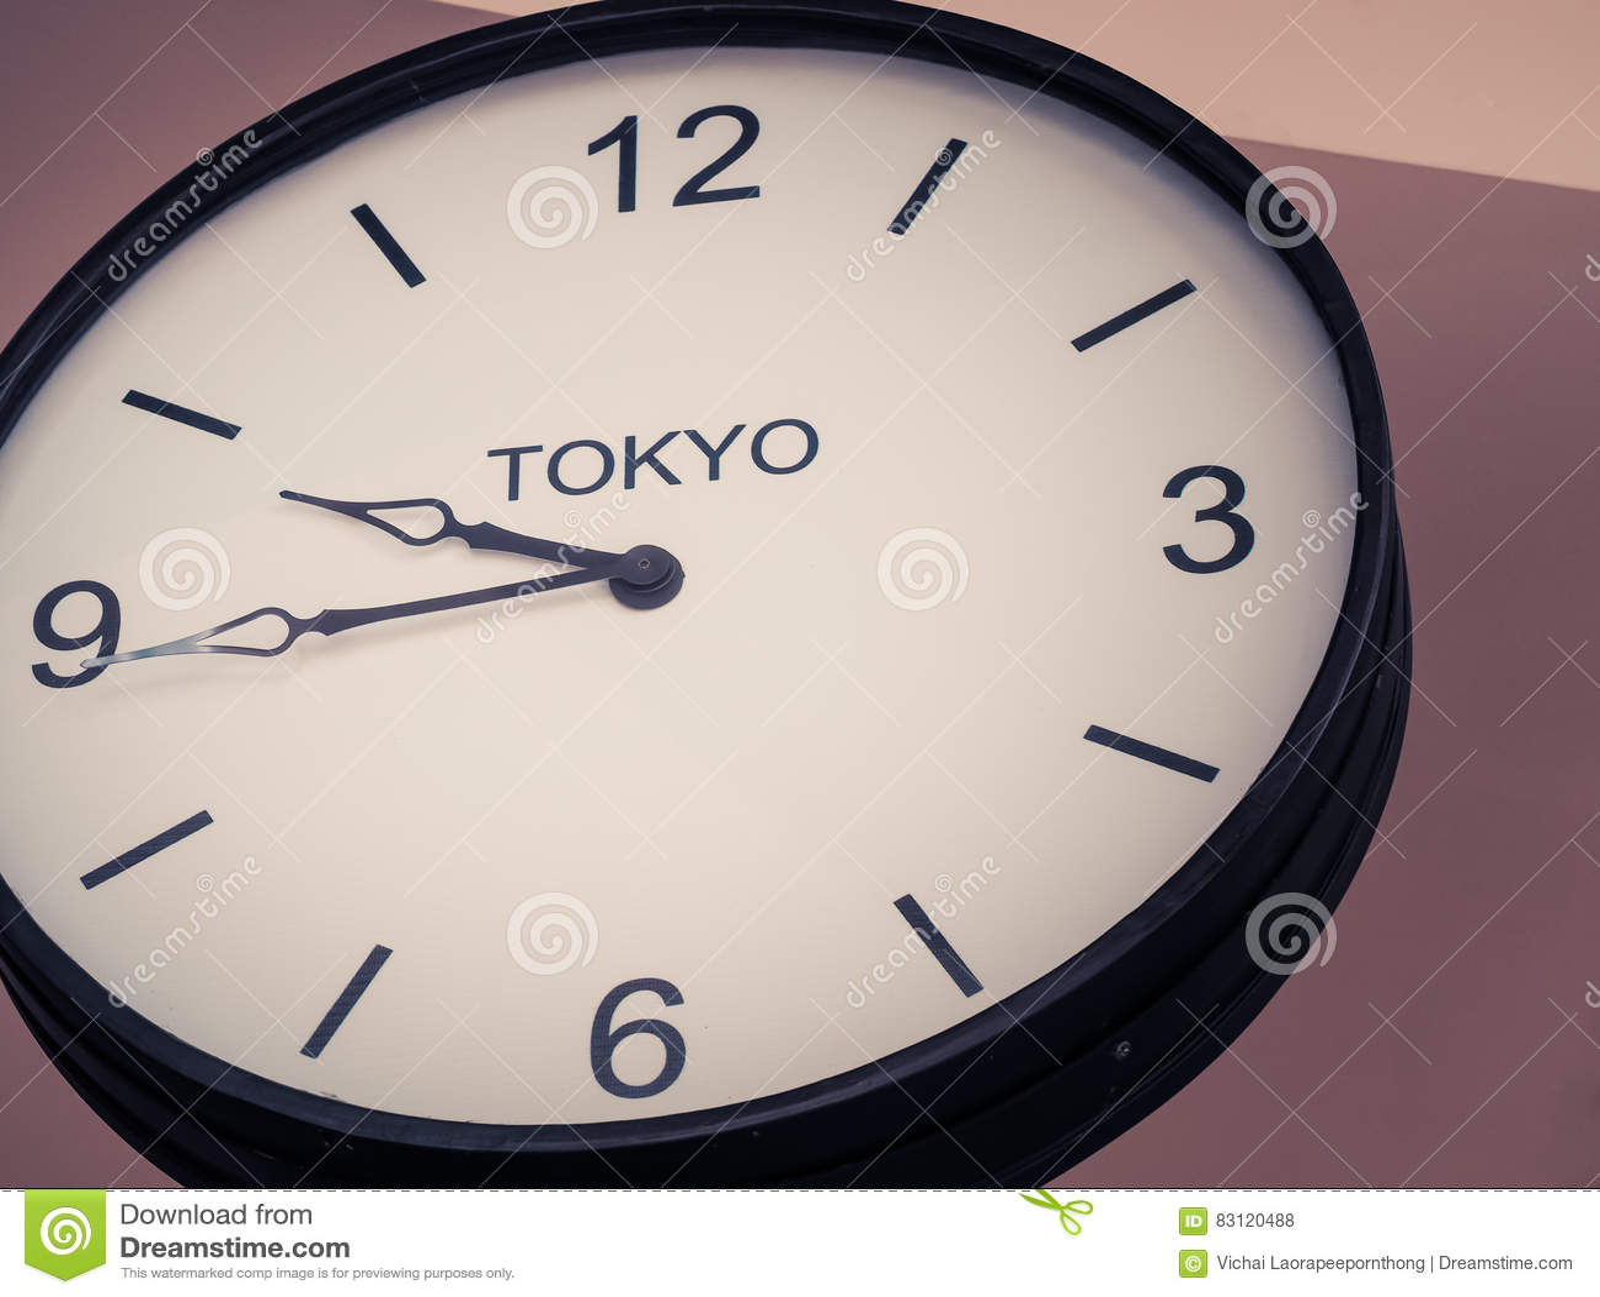 Japanese time clock prt2bmw 6